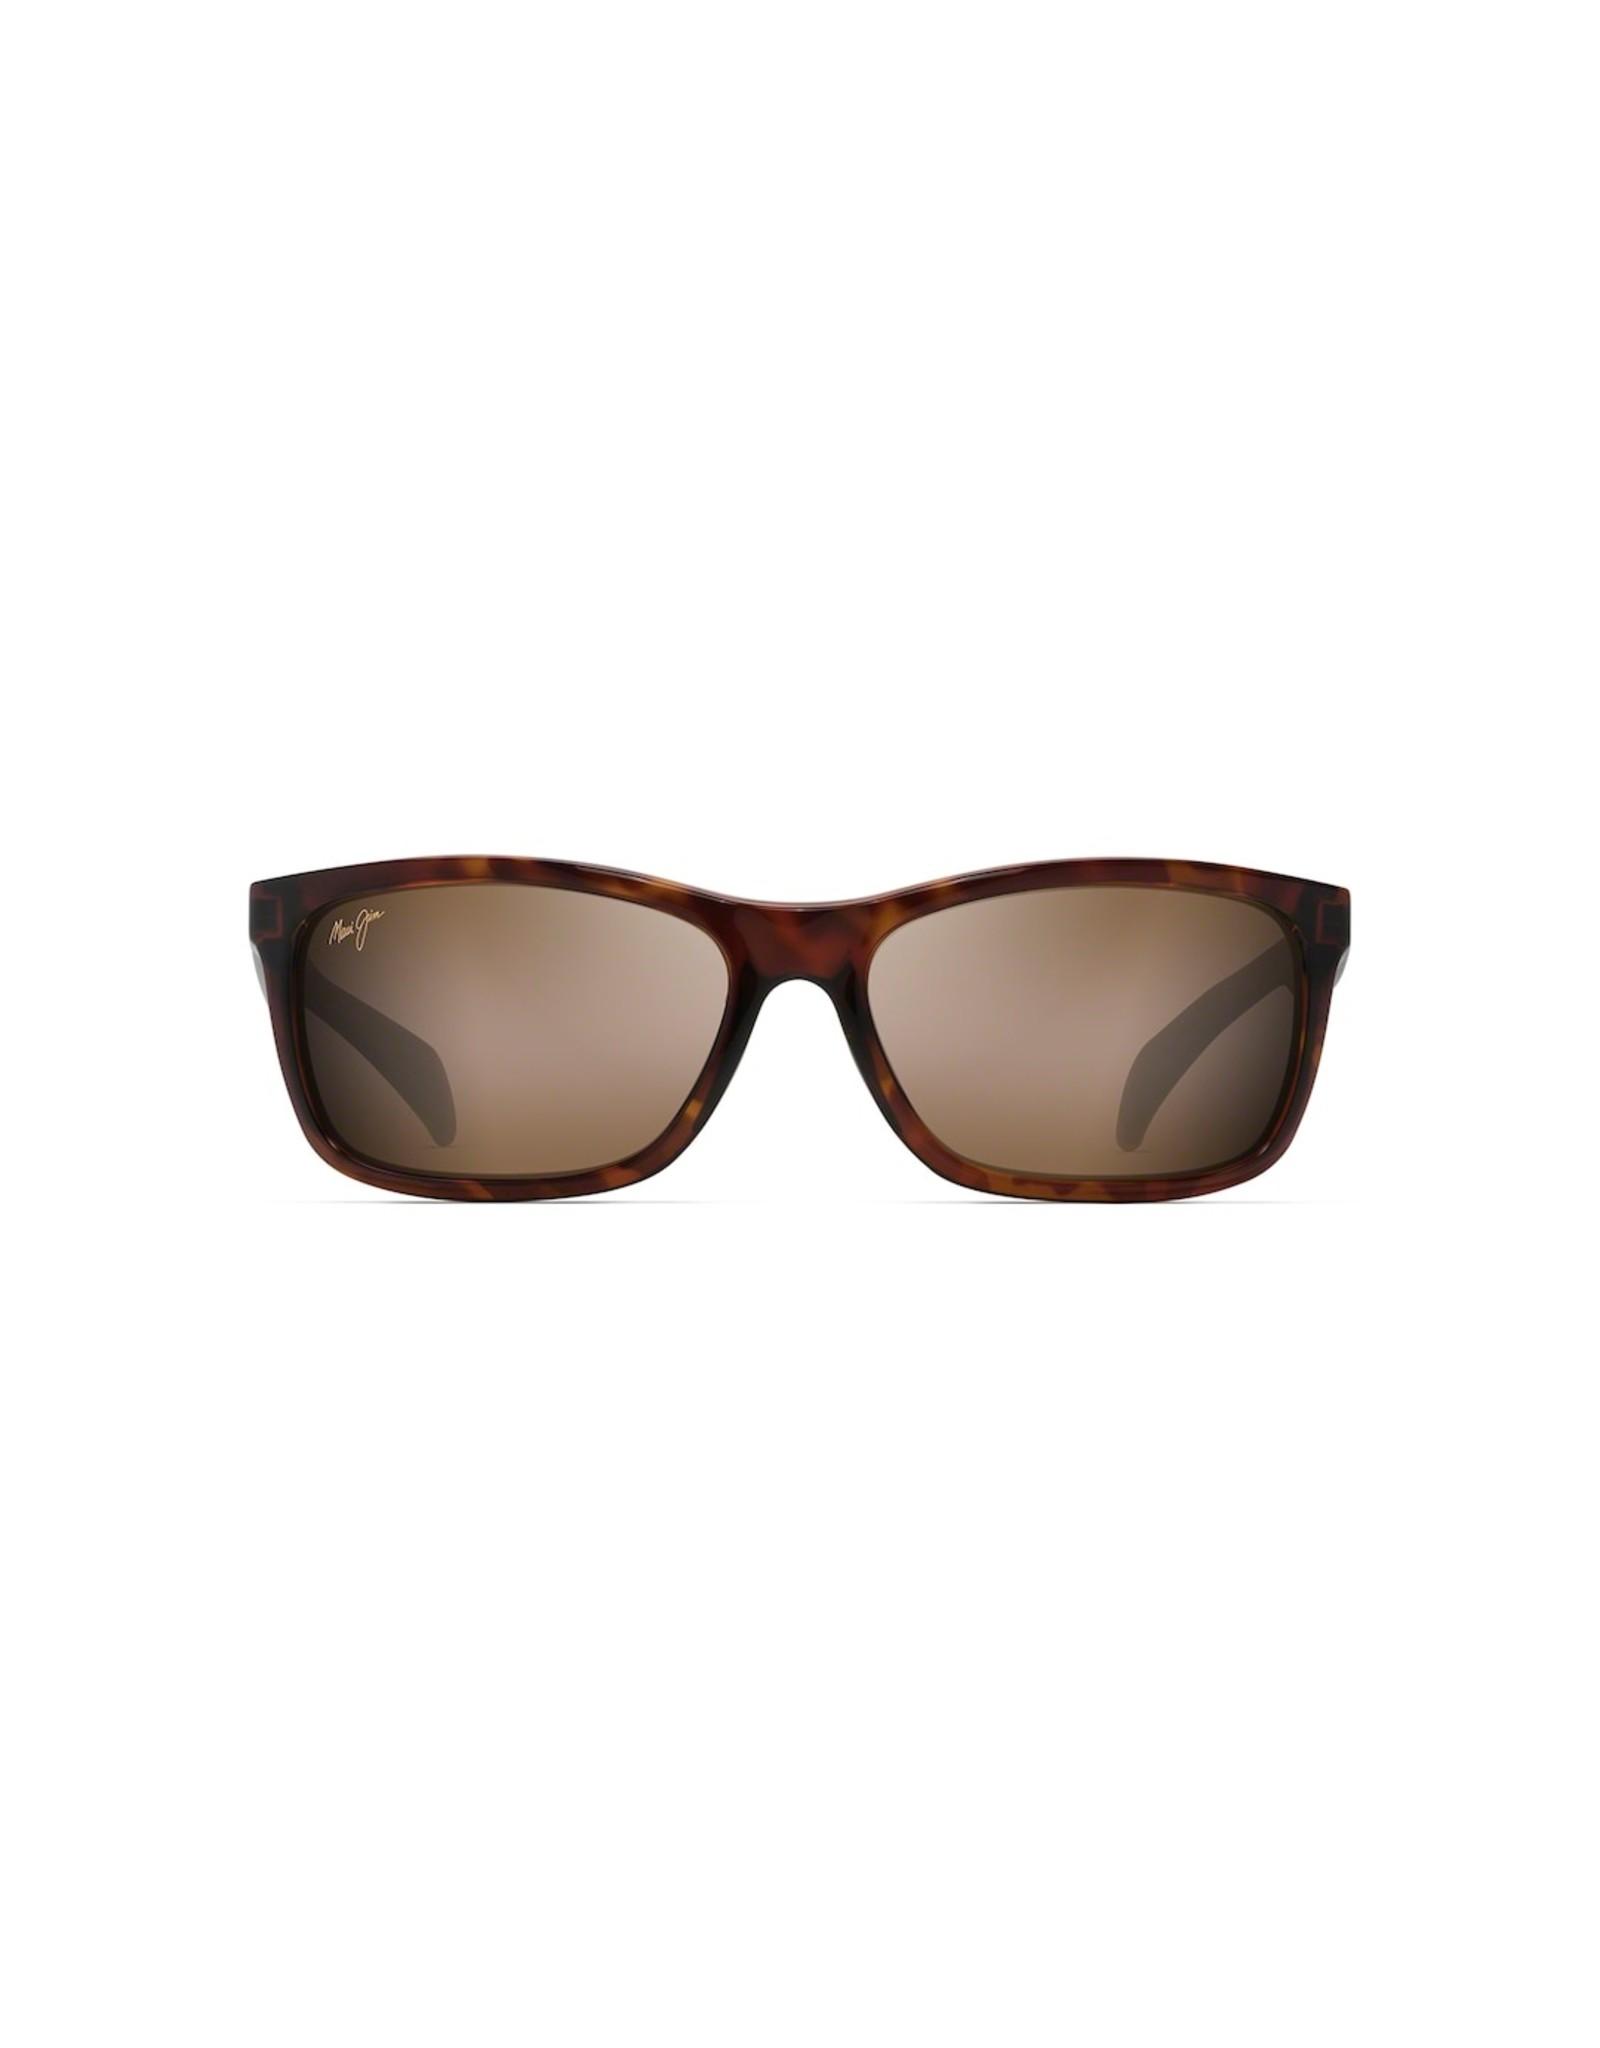 Maui Jim Maui Jim 'PUHI' Sunglasses